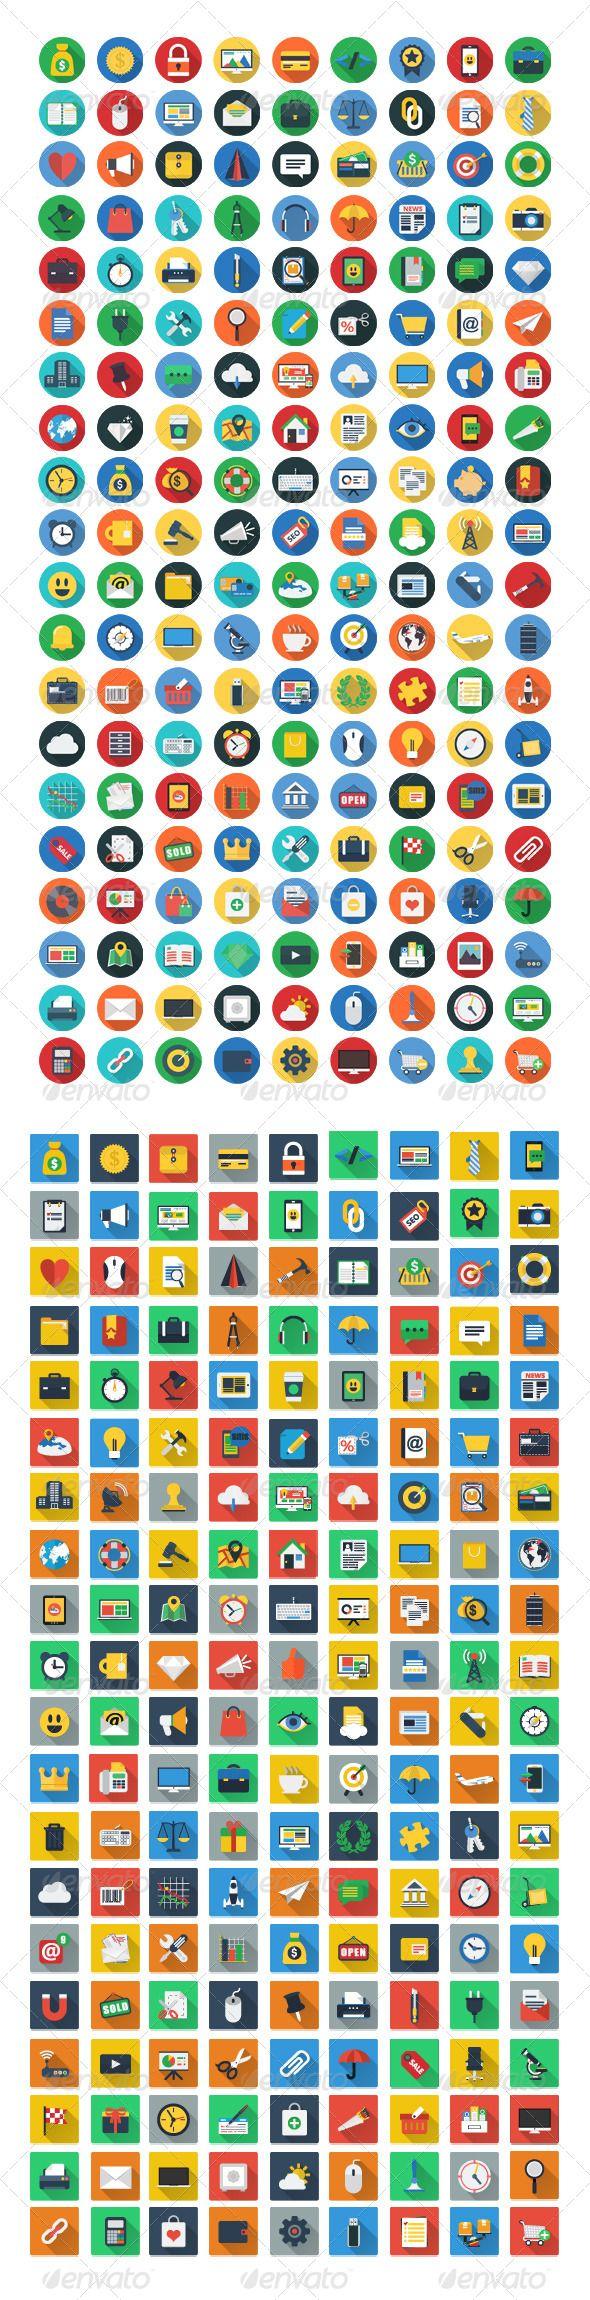 200 Flat Icons   Mobile marketing, app, app development, business, colorful, communication, computer, cross platform, development, flat icon, flat icons, flat icons set, glyphs, graphics, icon, icons, icons flat, interface, internet, line, long shadow, mac, media, modern, responsive, seo icons, social media, social network, stroke, web